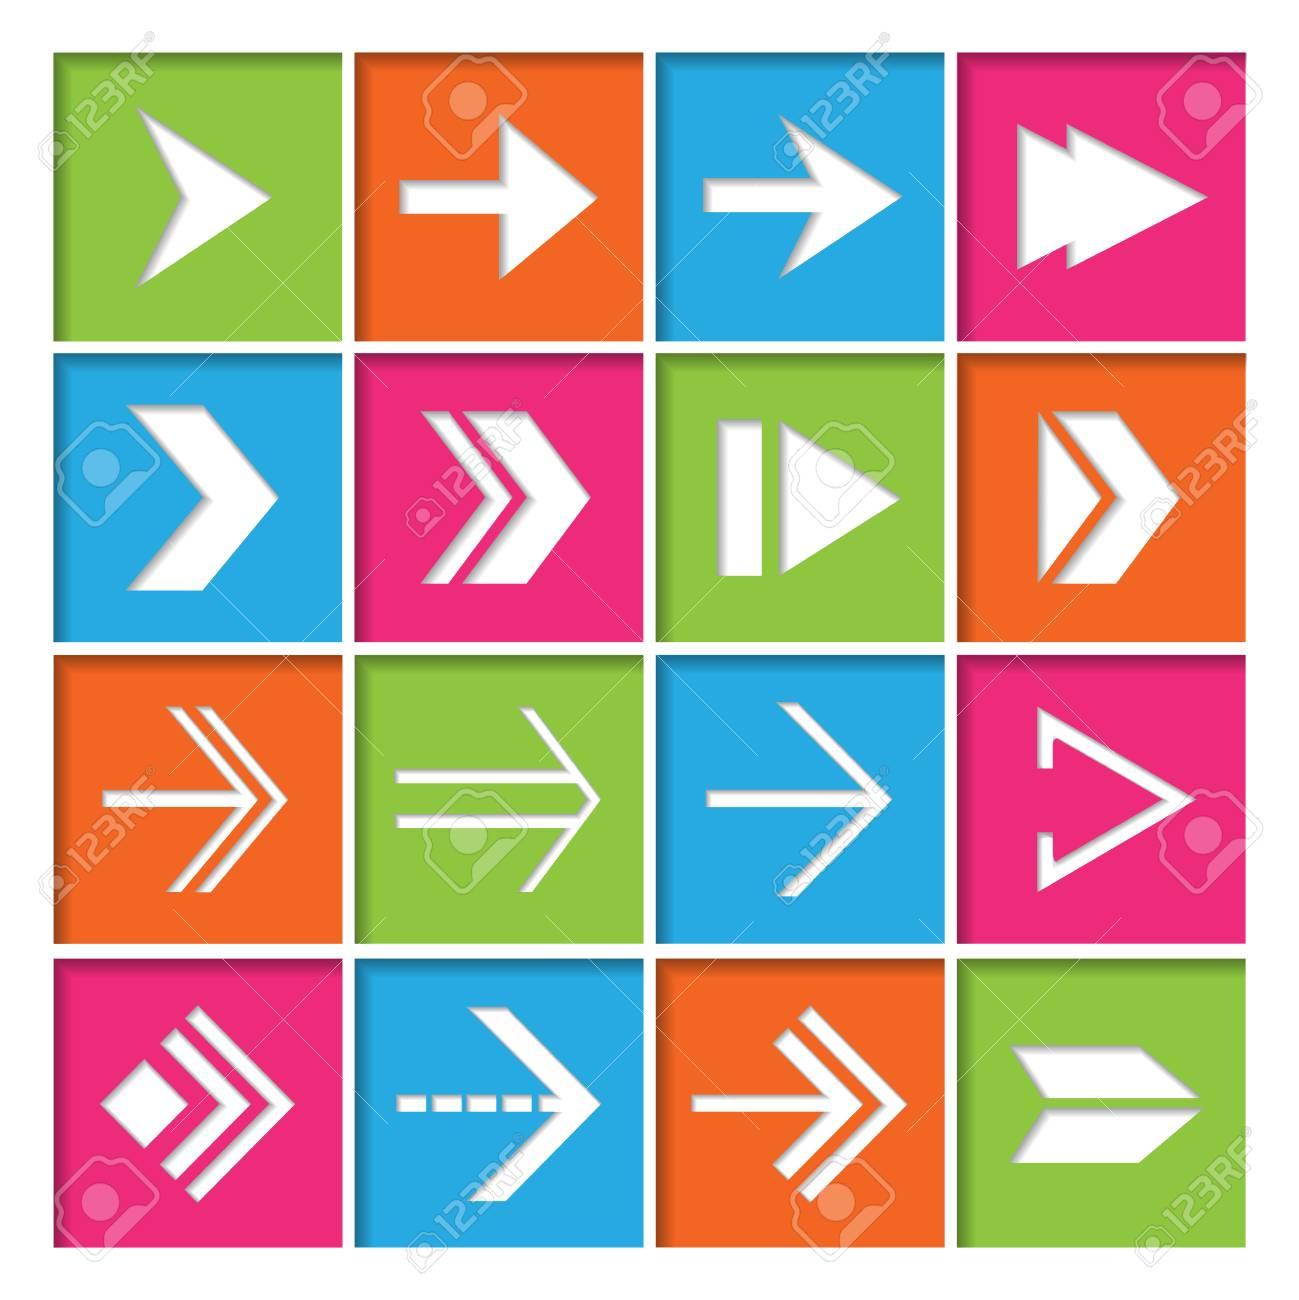 Vorwärts Nächsten Pfeile Symbole Symbole Für Elektronische Geräte ...